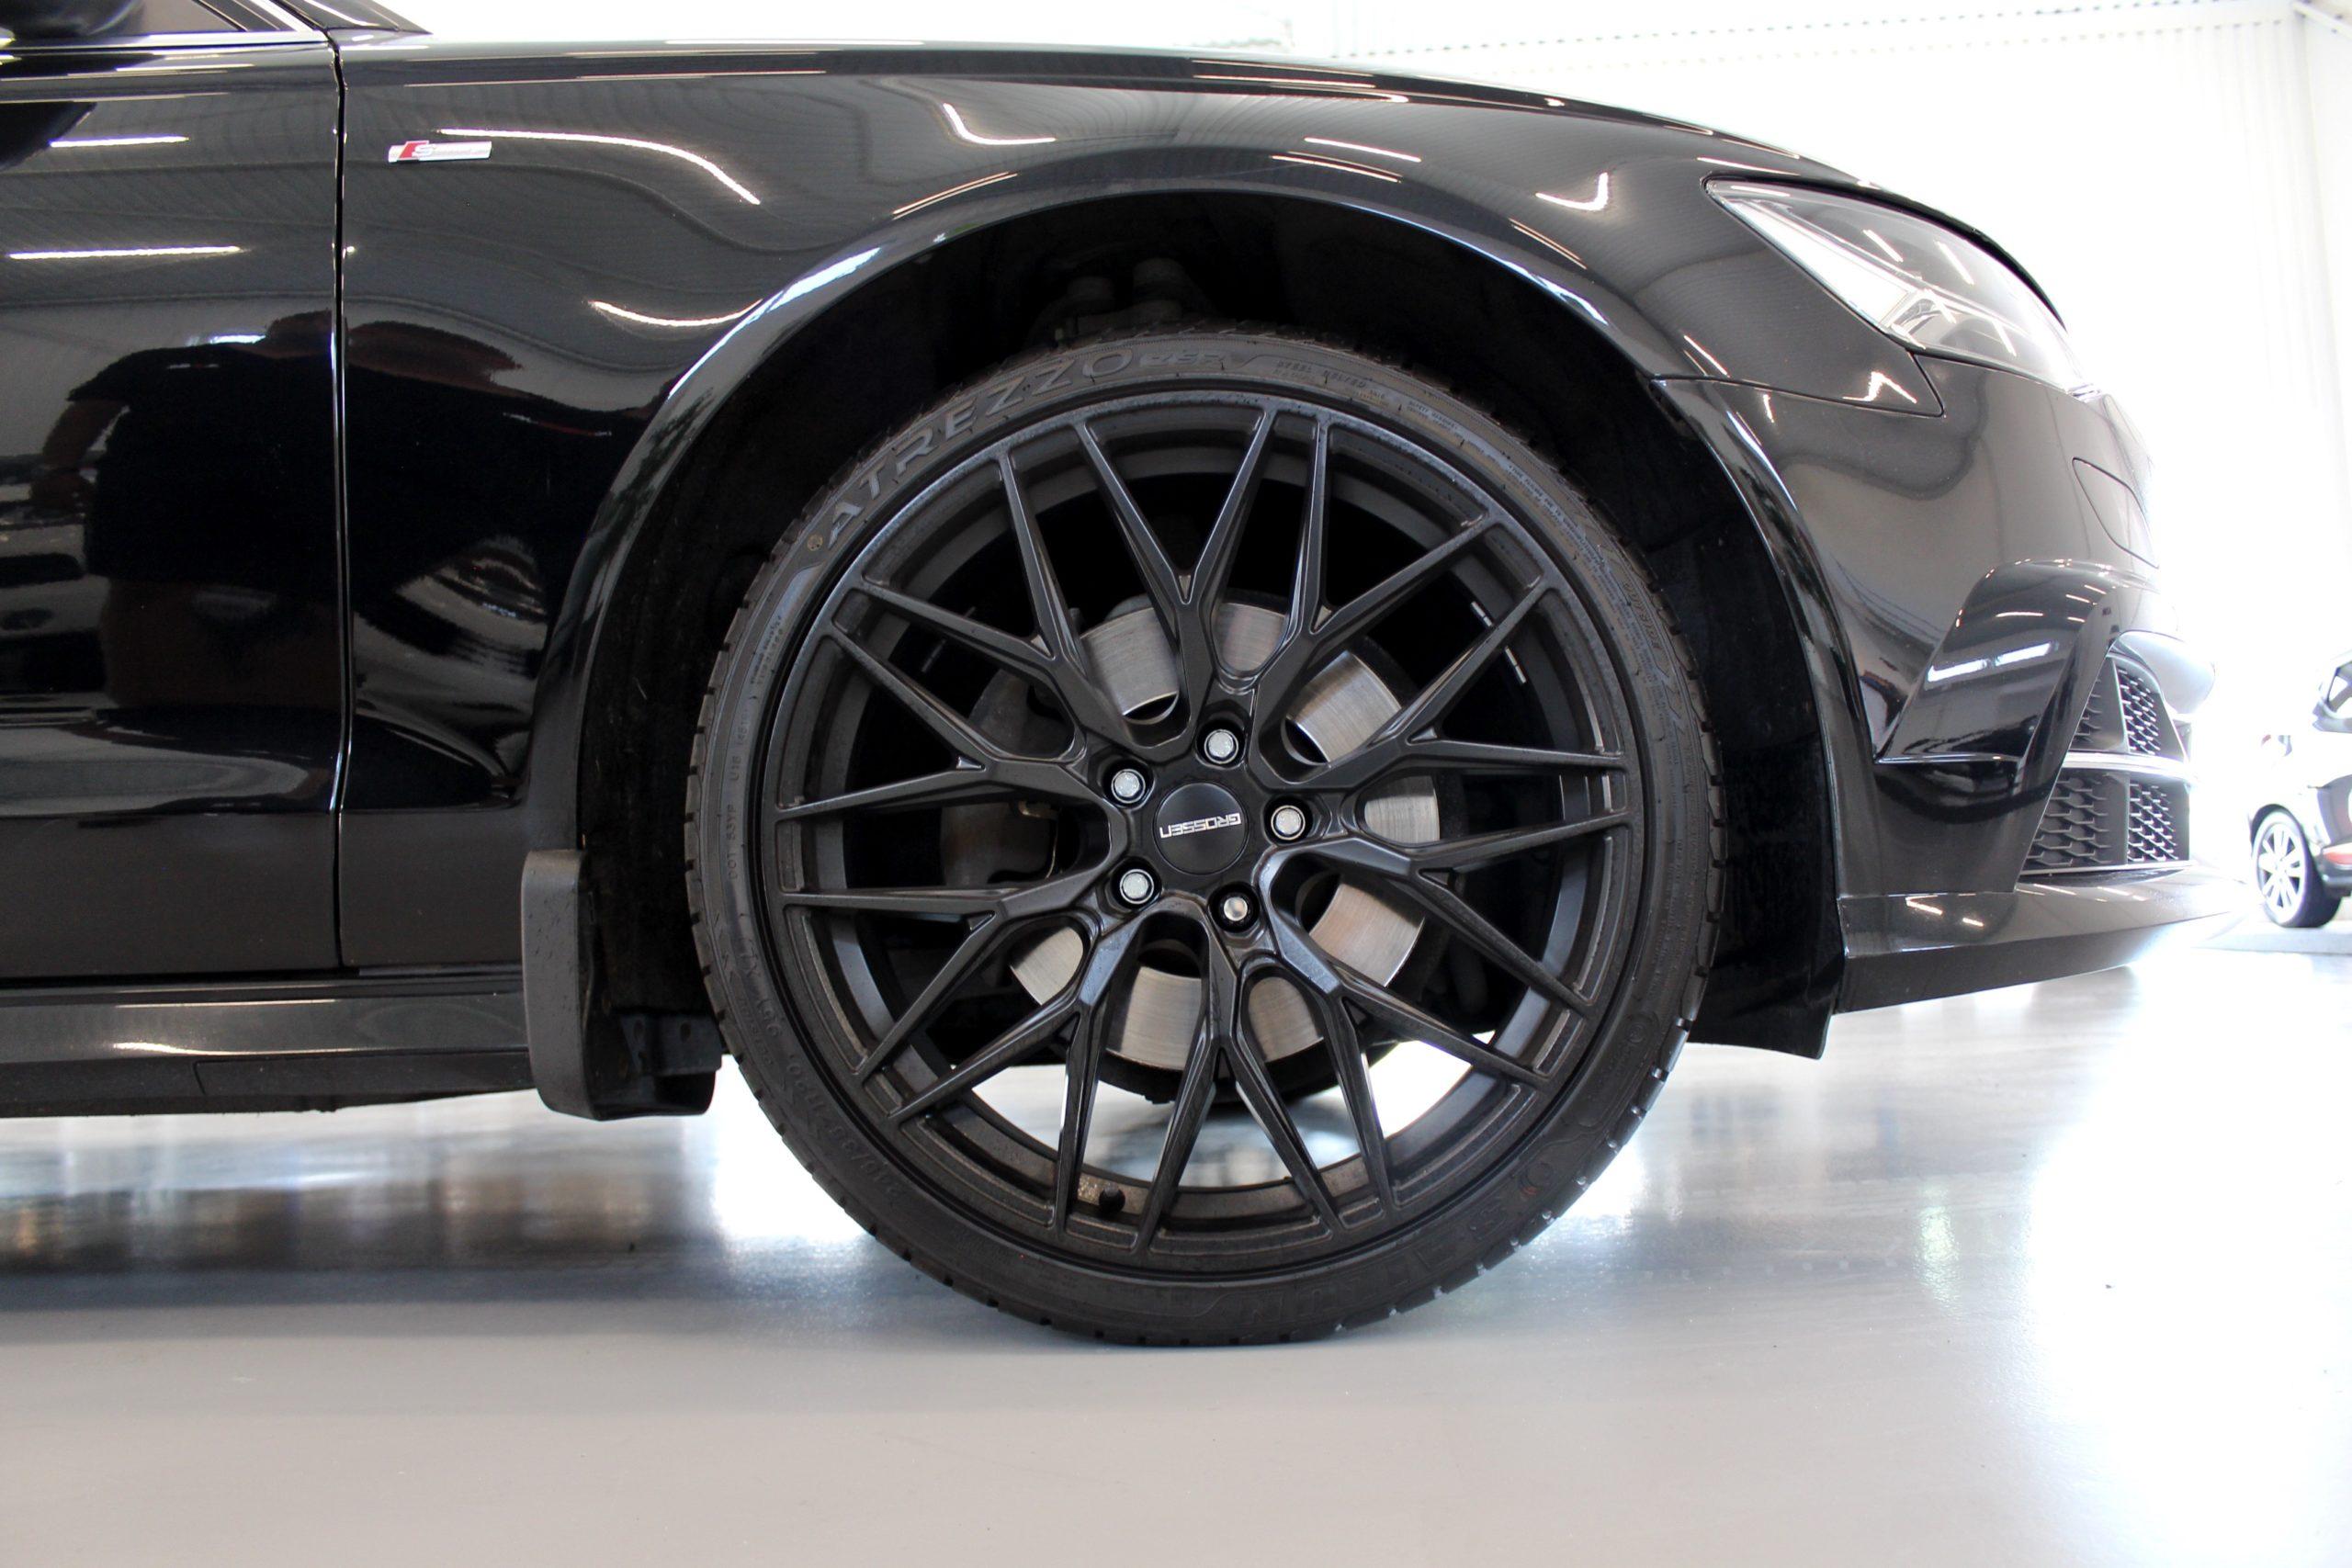 Audi A6 Avant 2.0 TDI quattro Sport Edition Ambition